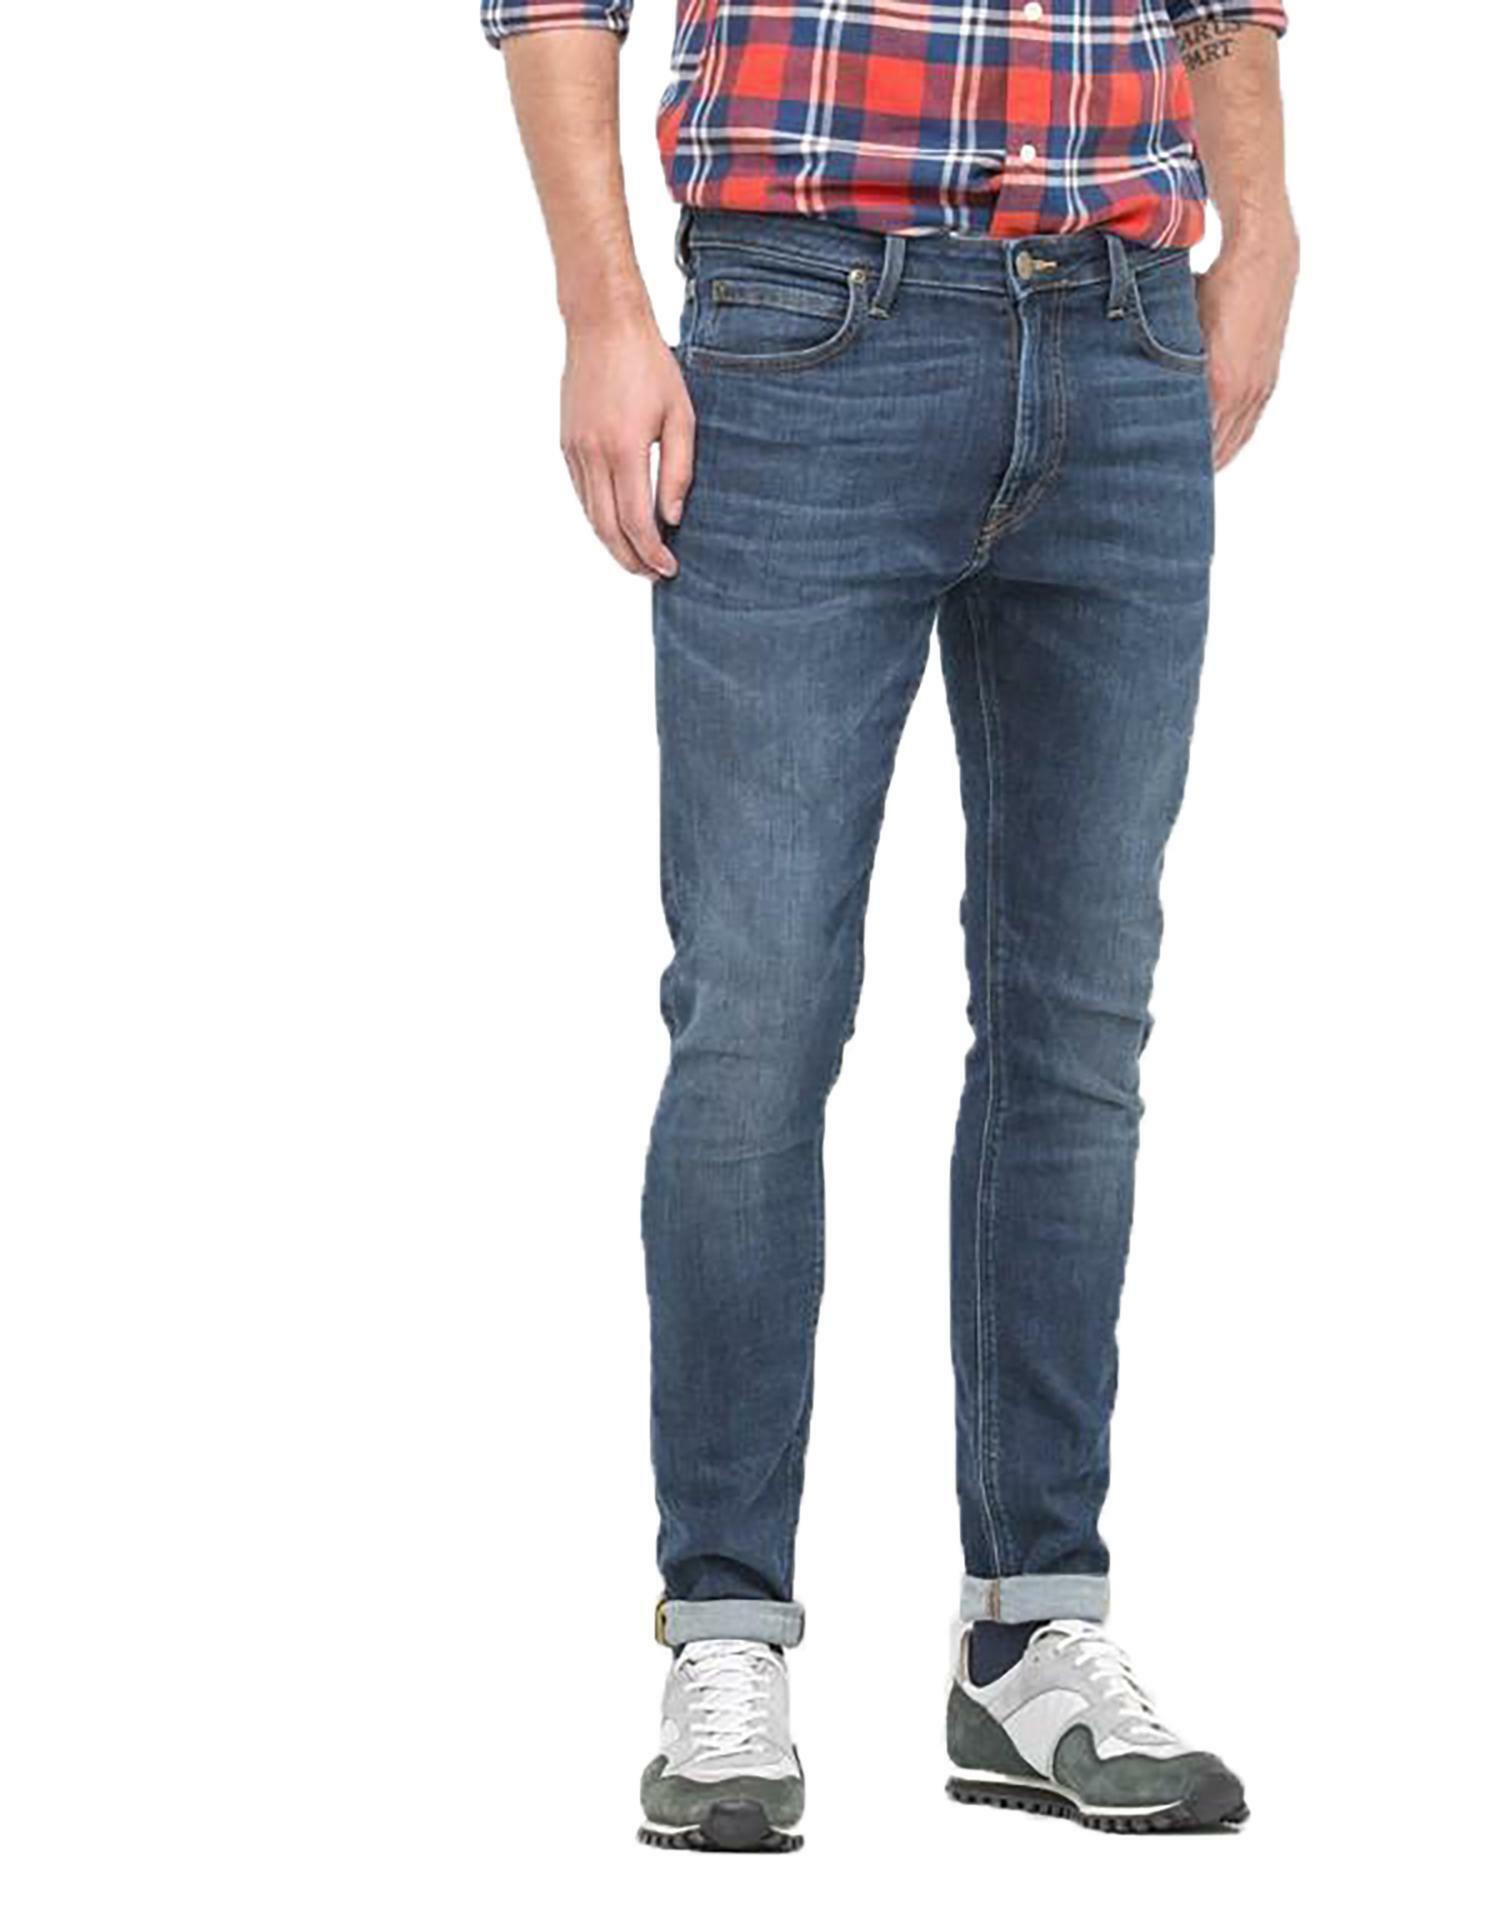 lee lee jeans uomo malone blue denim